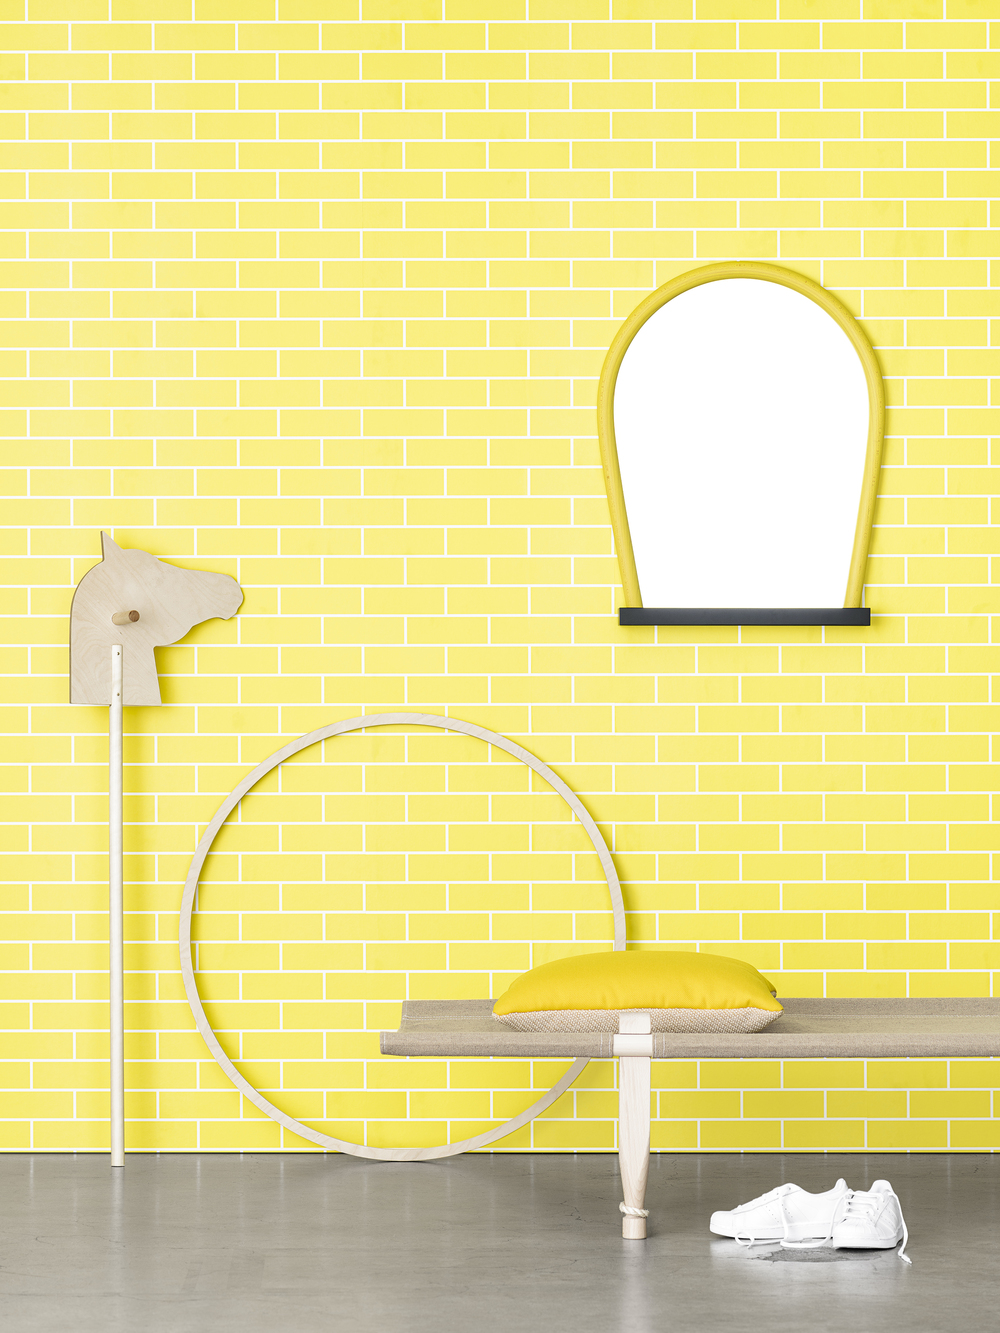 AcneJR_tegel_yellow_Photowall.jpg